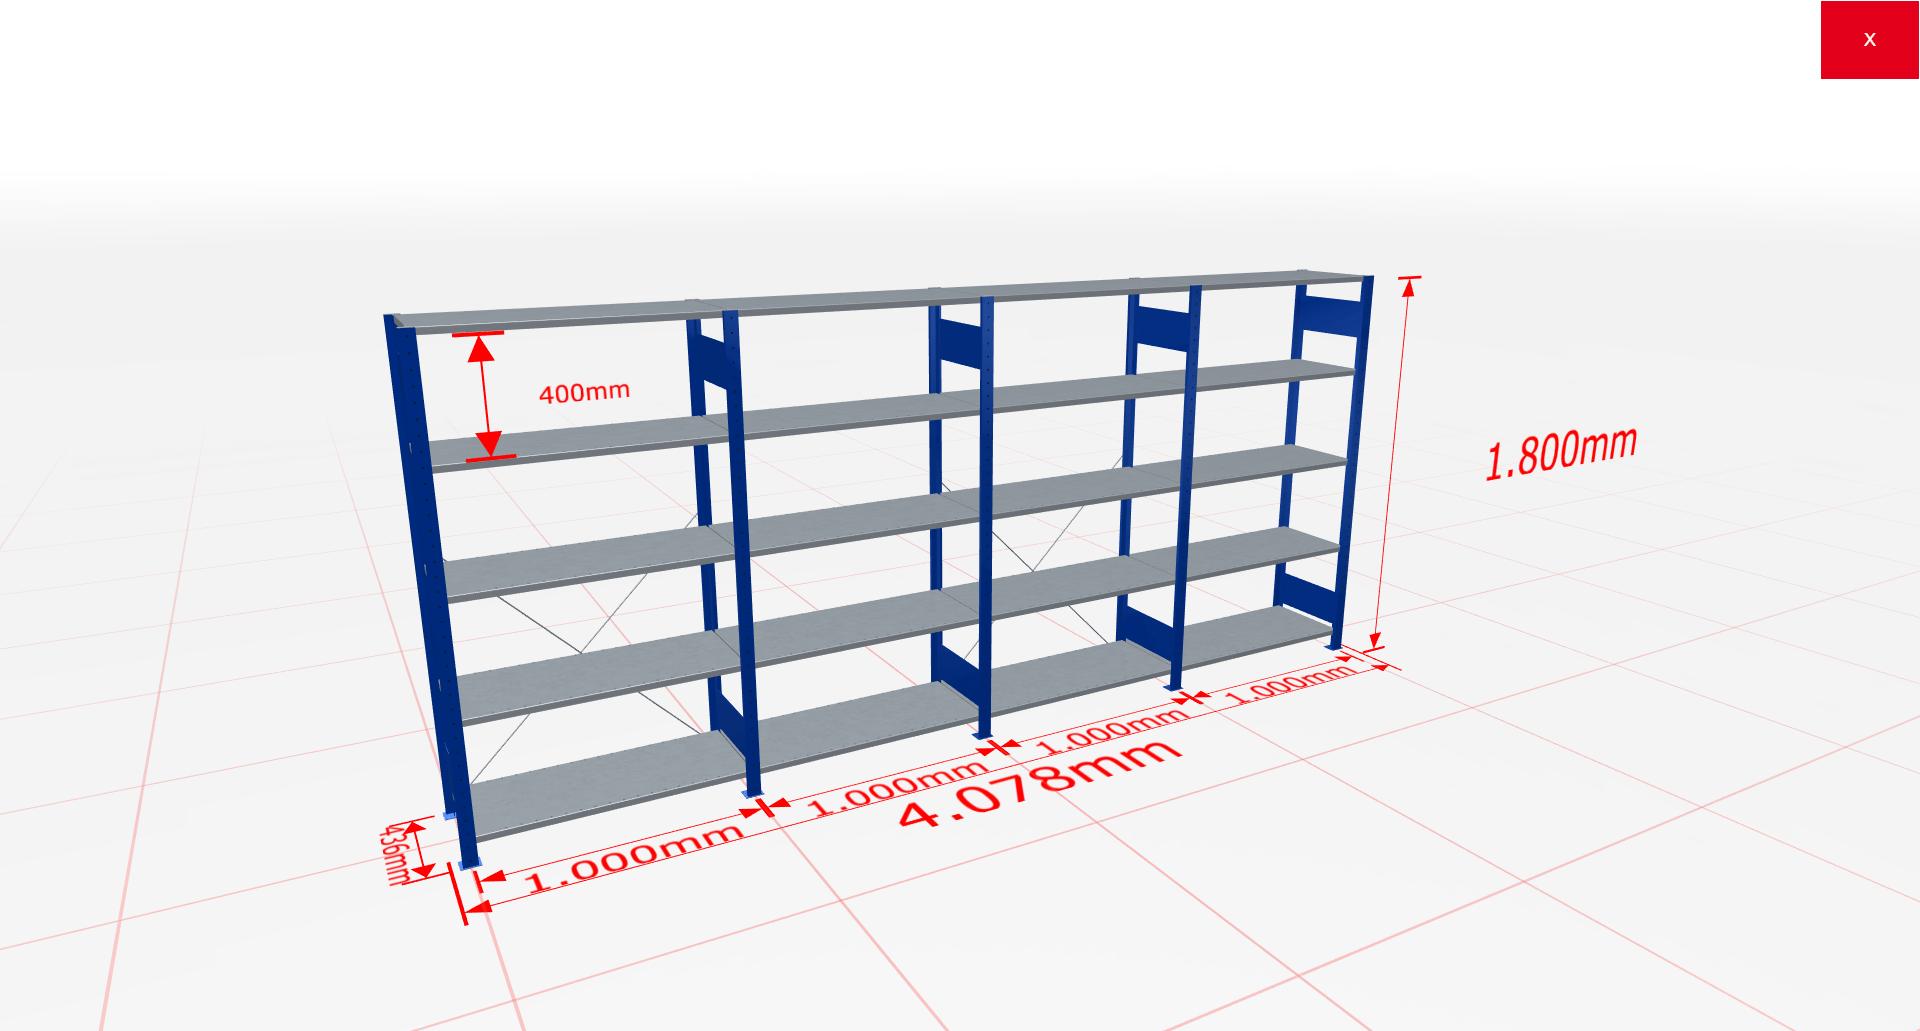 Fachbodenregal Komplettregal 1800x4078x400 mm (HxBxT) SCHULTE Lagertechnik blau 5 Ebenen  150 kg je Boden